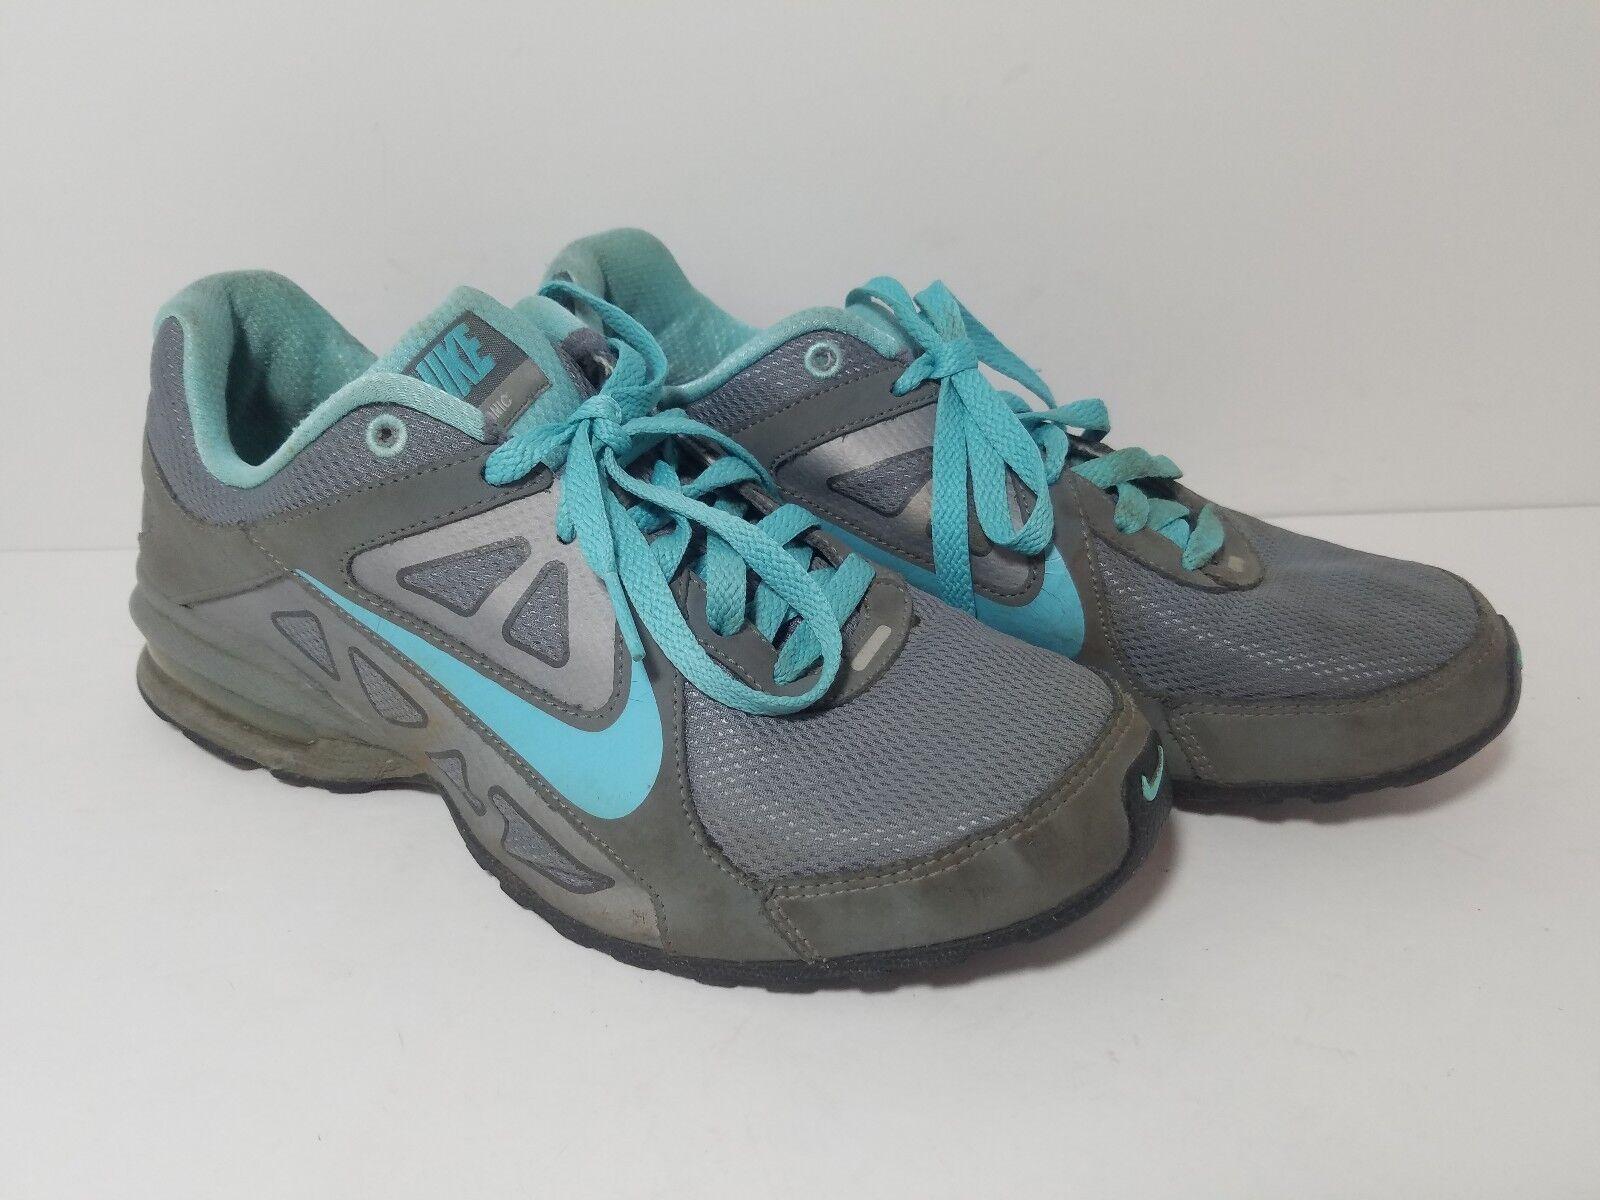 1eea20116b5cd Nike Air Max Max Max Sonic Grey Teal (519142-040) Size 9.5 3b941f ...